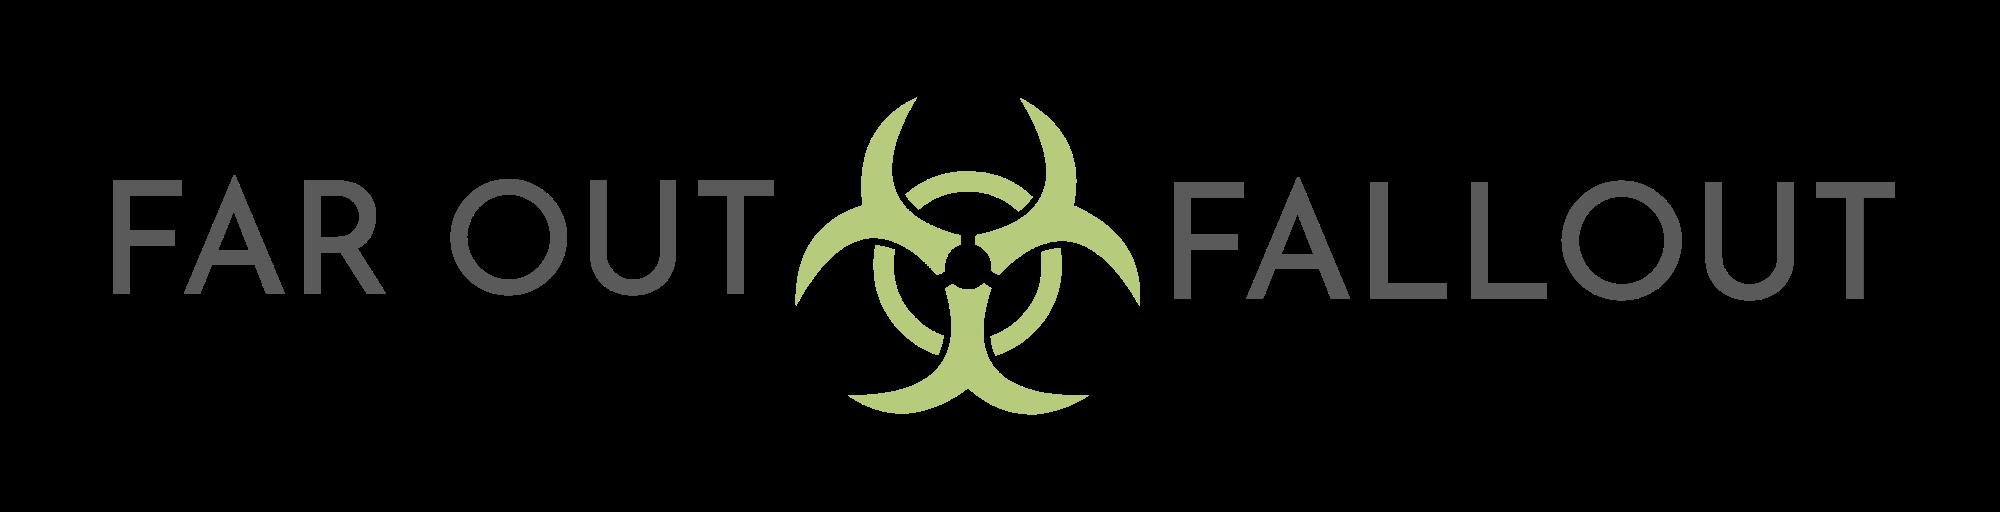 FAR OUT-logo.png